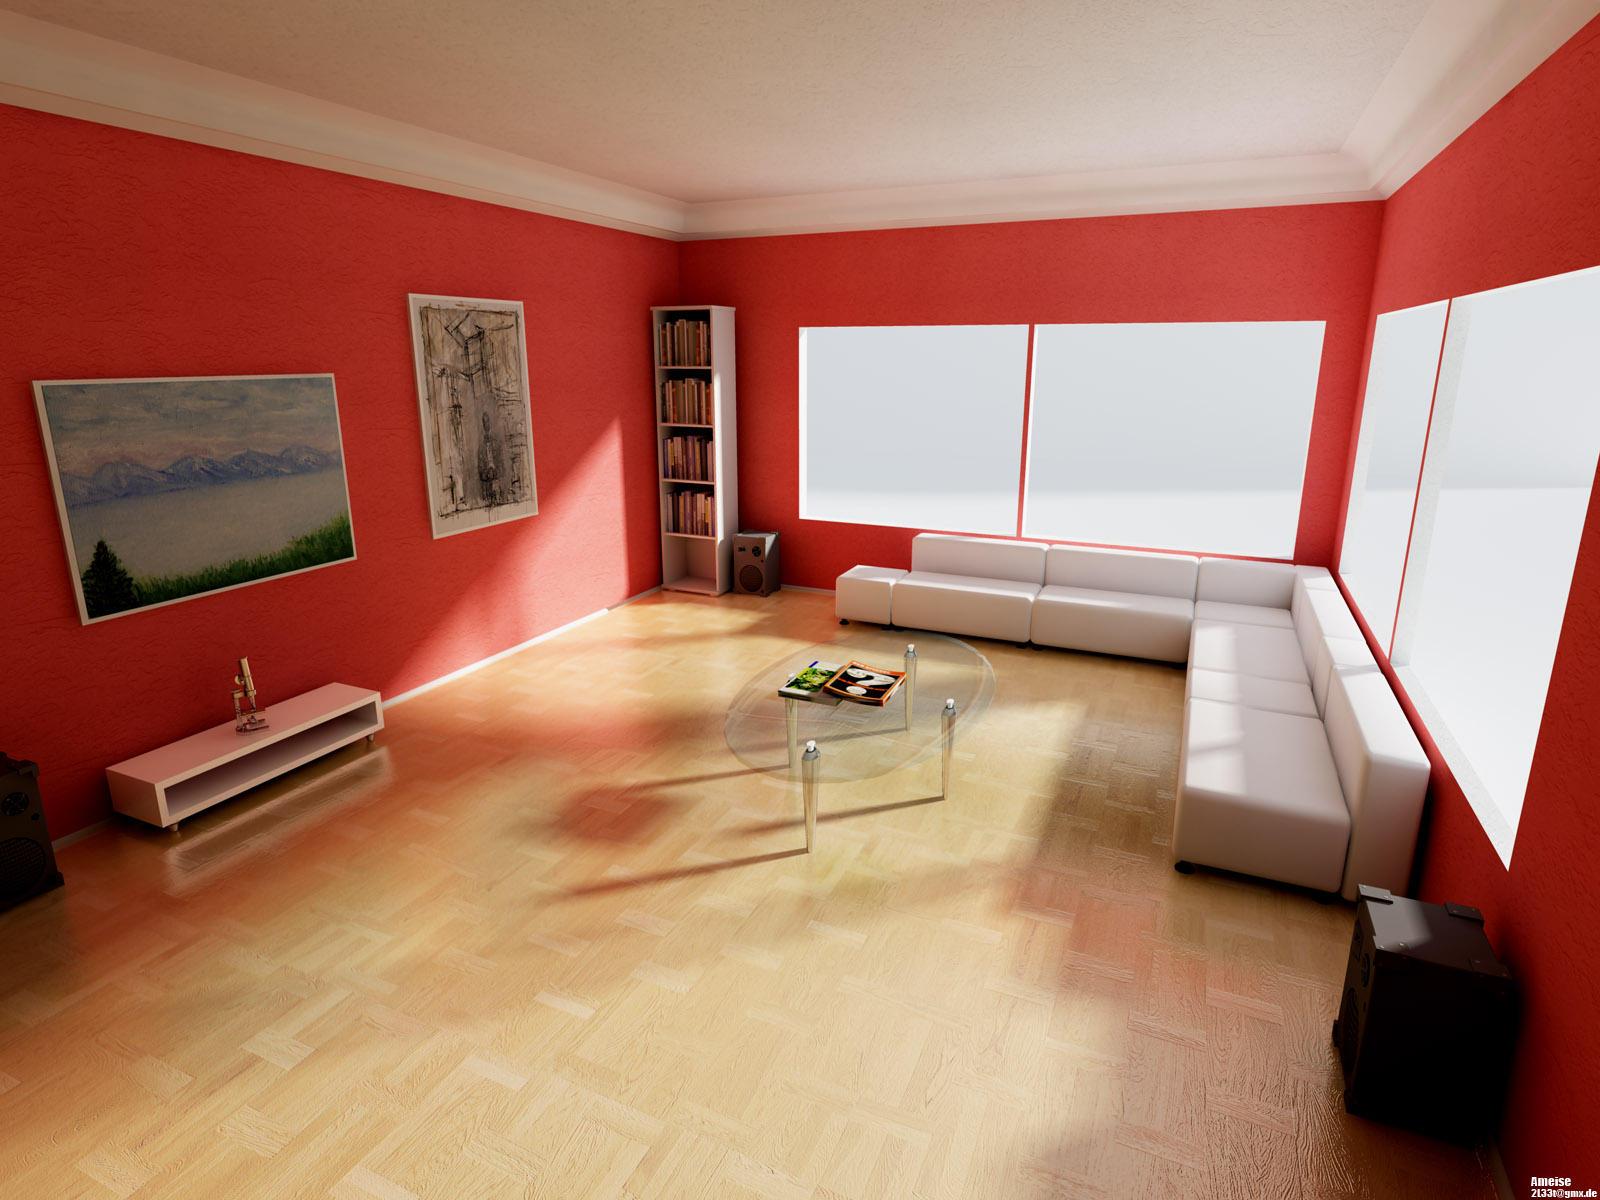 Red room by ameise on deviantart for Ideas para decorar salas modernas